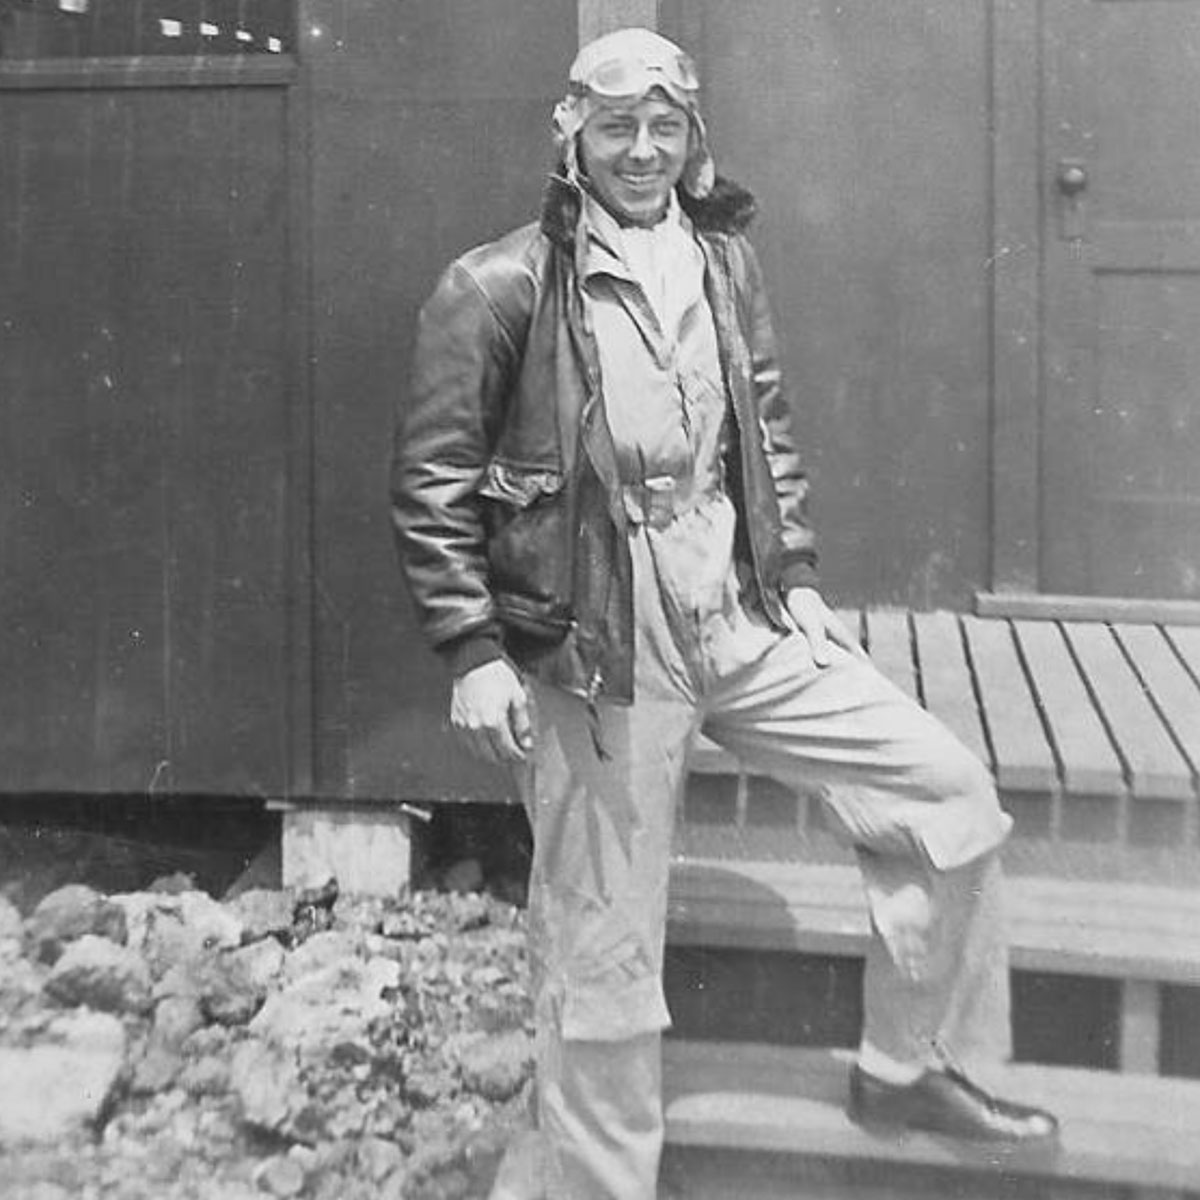 Navy Reserve Aviation Ordnanceman 2nd Class Ora H. Sharninghouse